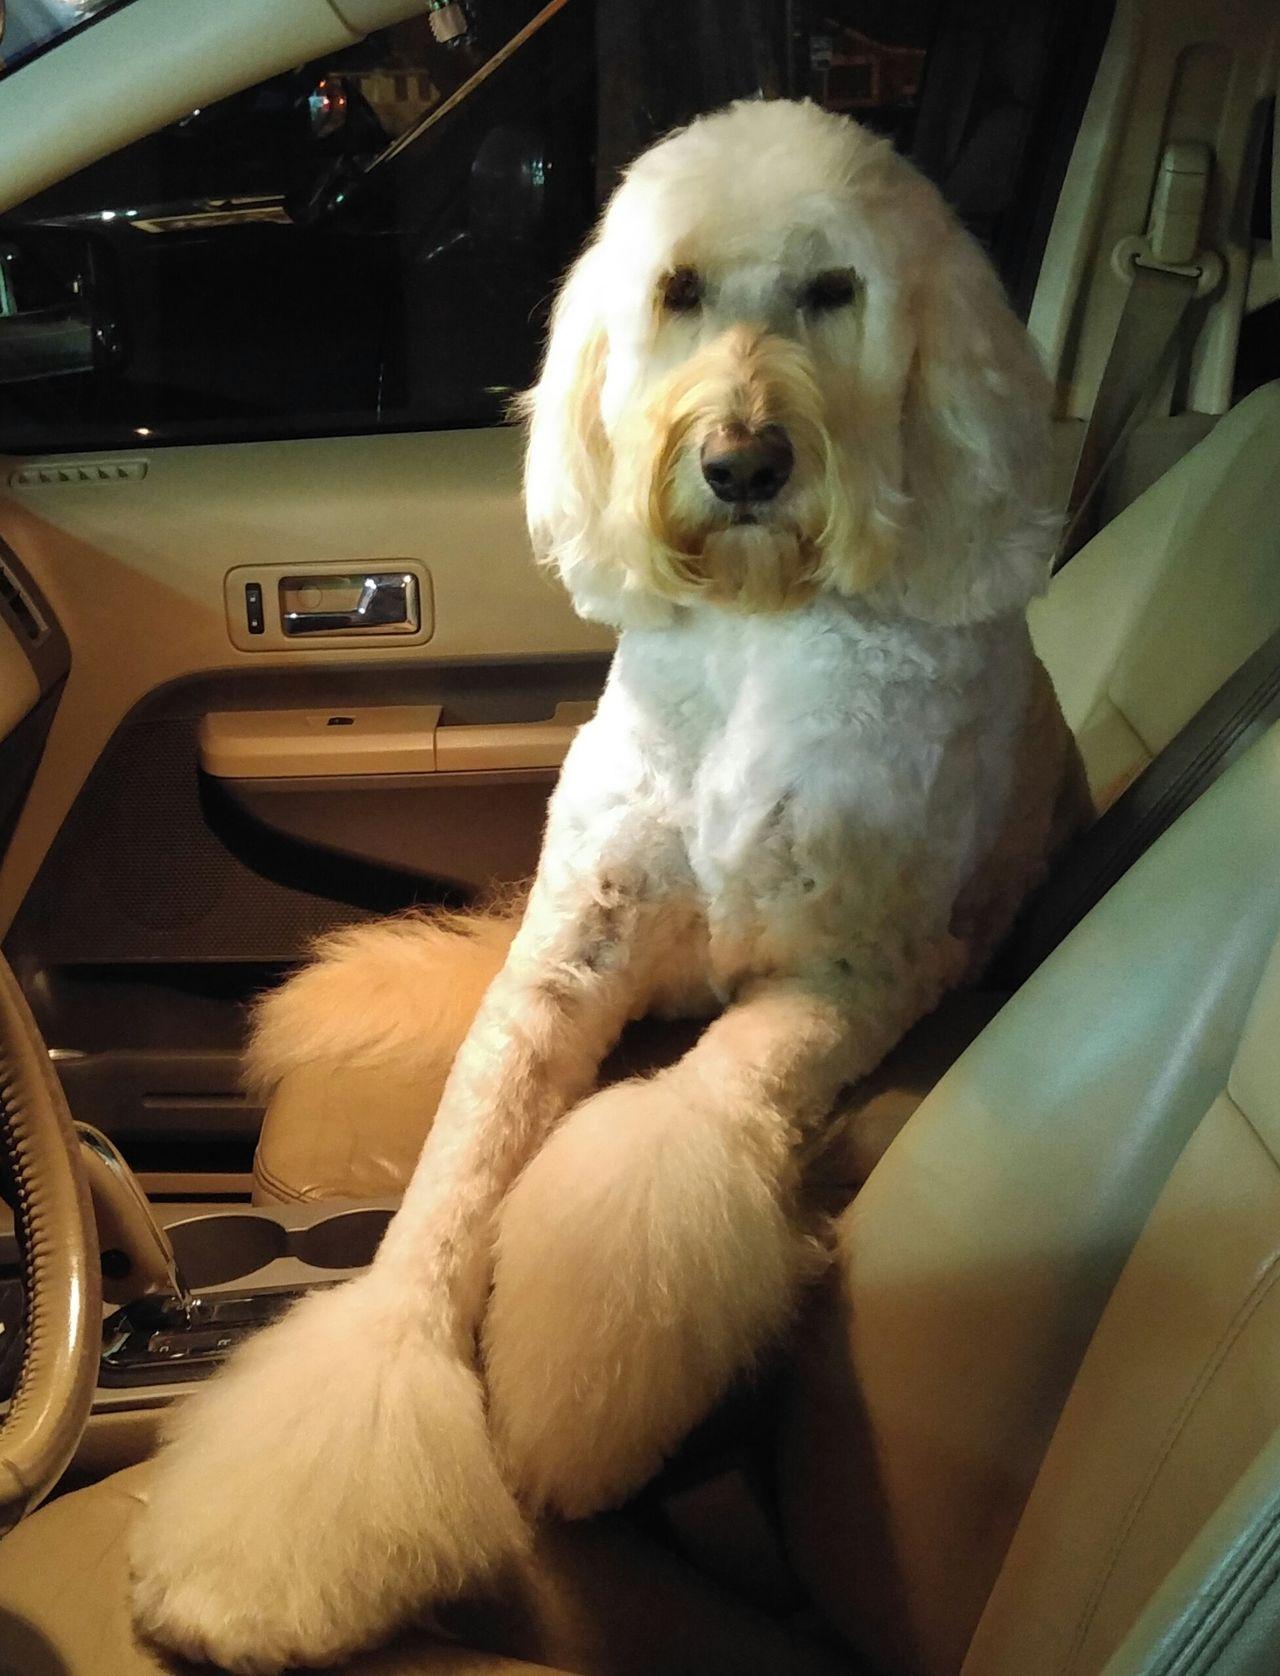 Q QUINTESSENTIAL RIDE QUEENDOM Goldendoodle Dogslife Joyride Flufflepuff Dogs Of EyeEm My Girl ❤ Smartphonephotography Animal Photography Dog❤ Automobile Car Rides W/ My Bff